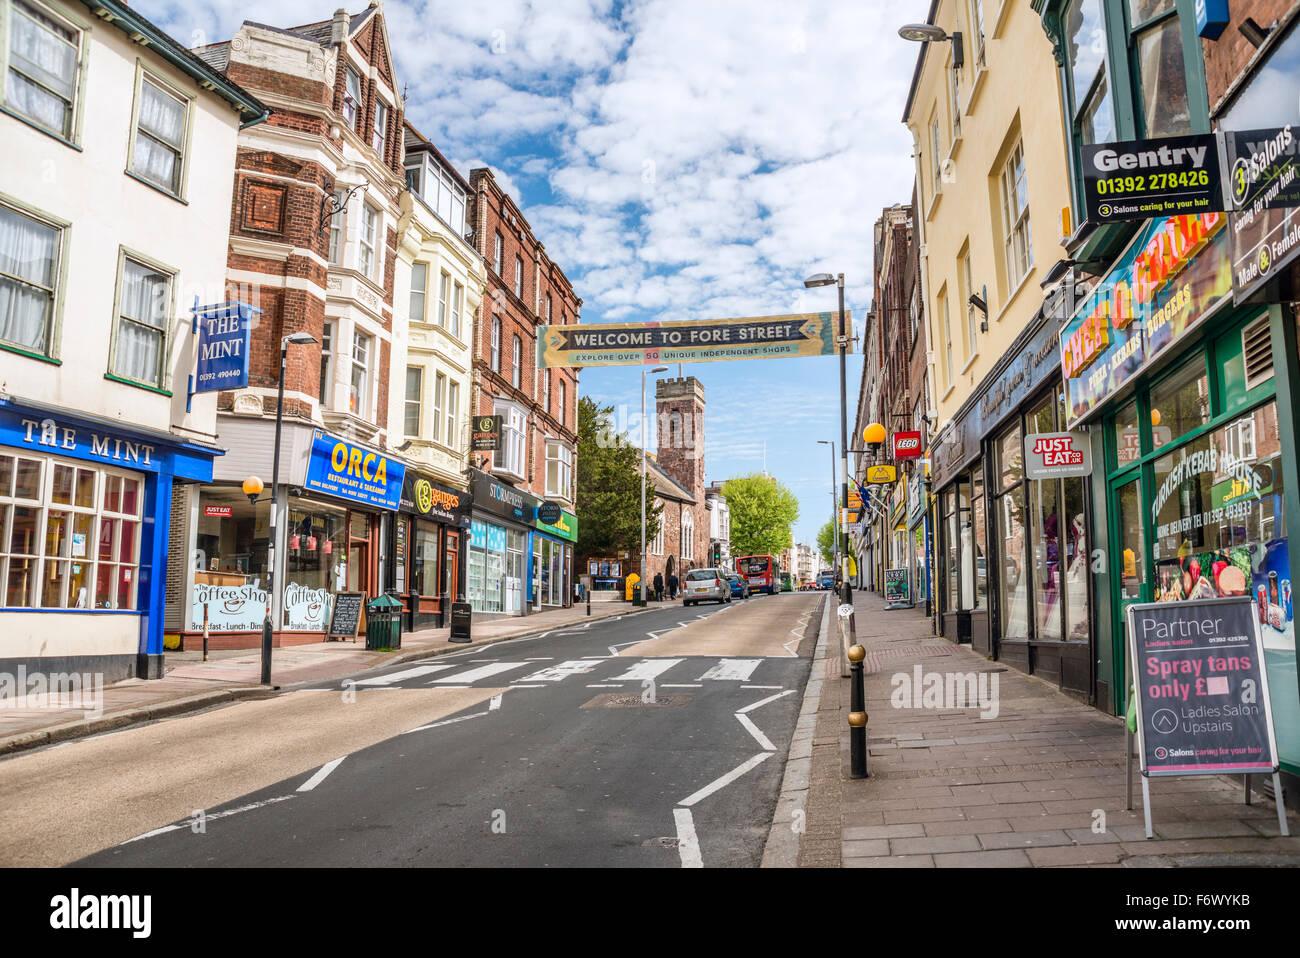 Fore Street Shops in the old town of Exeter, Devon, England, UK |  Fore Street Einkaufsstrasse in der Altstadt von - Stock Image